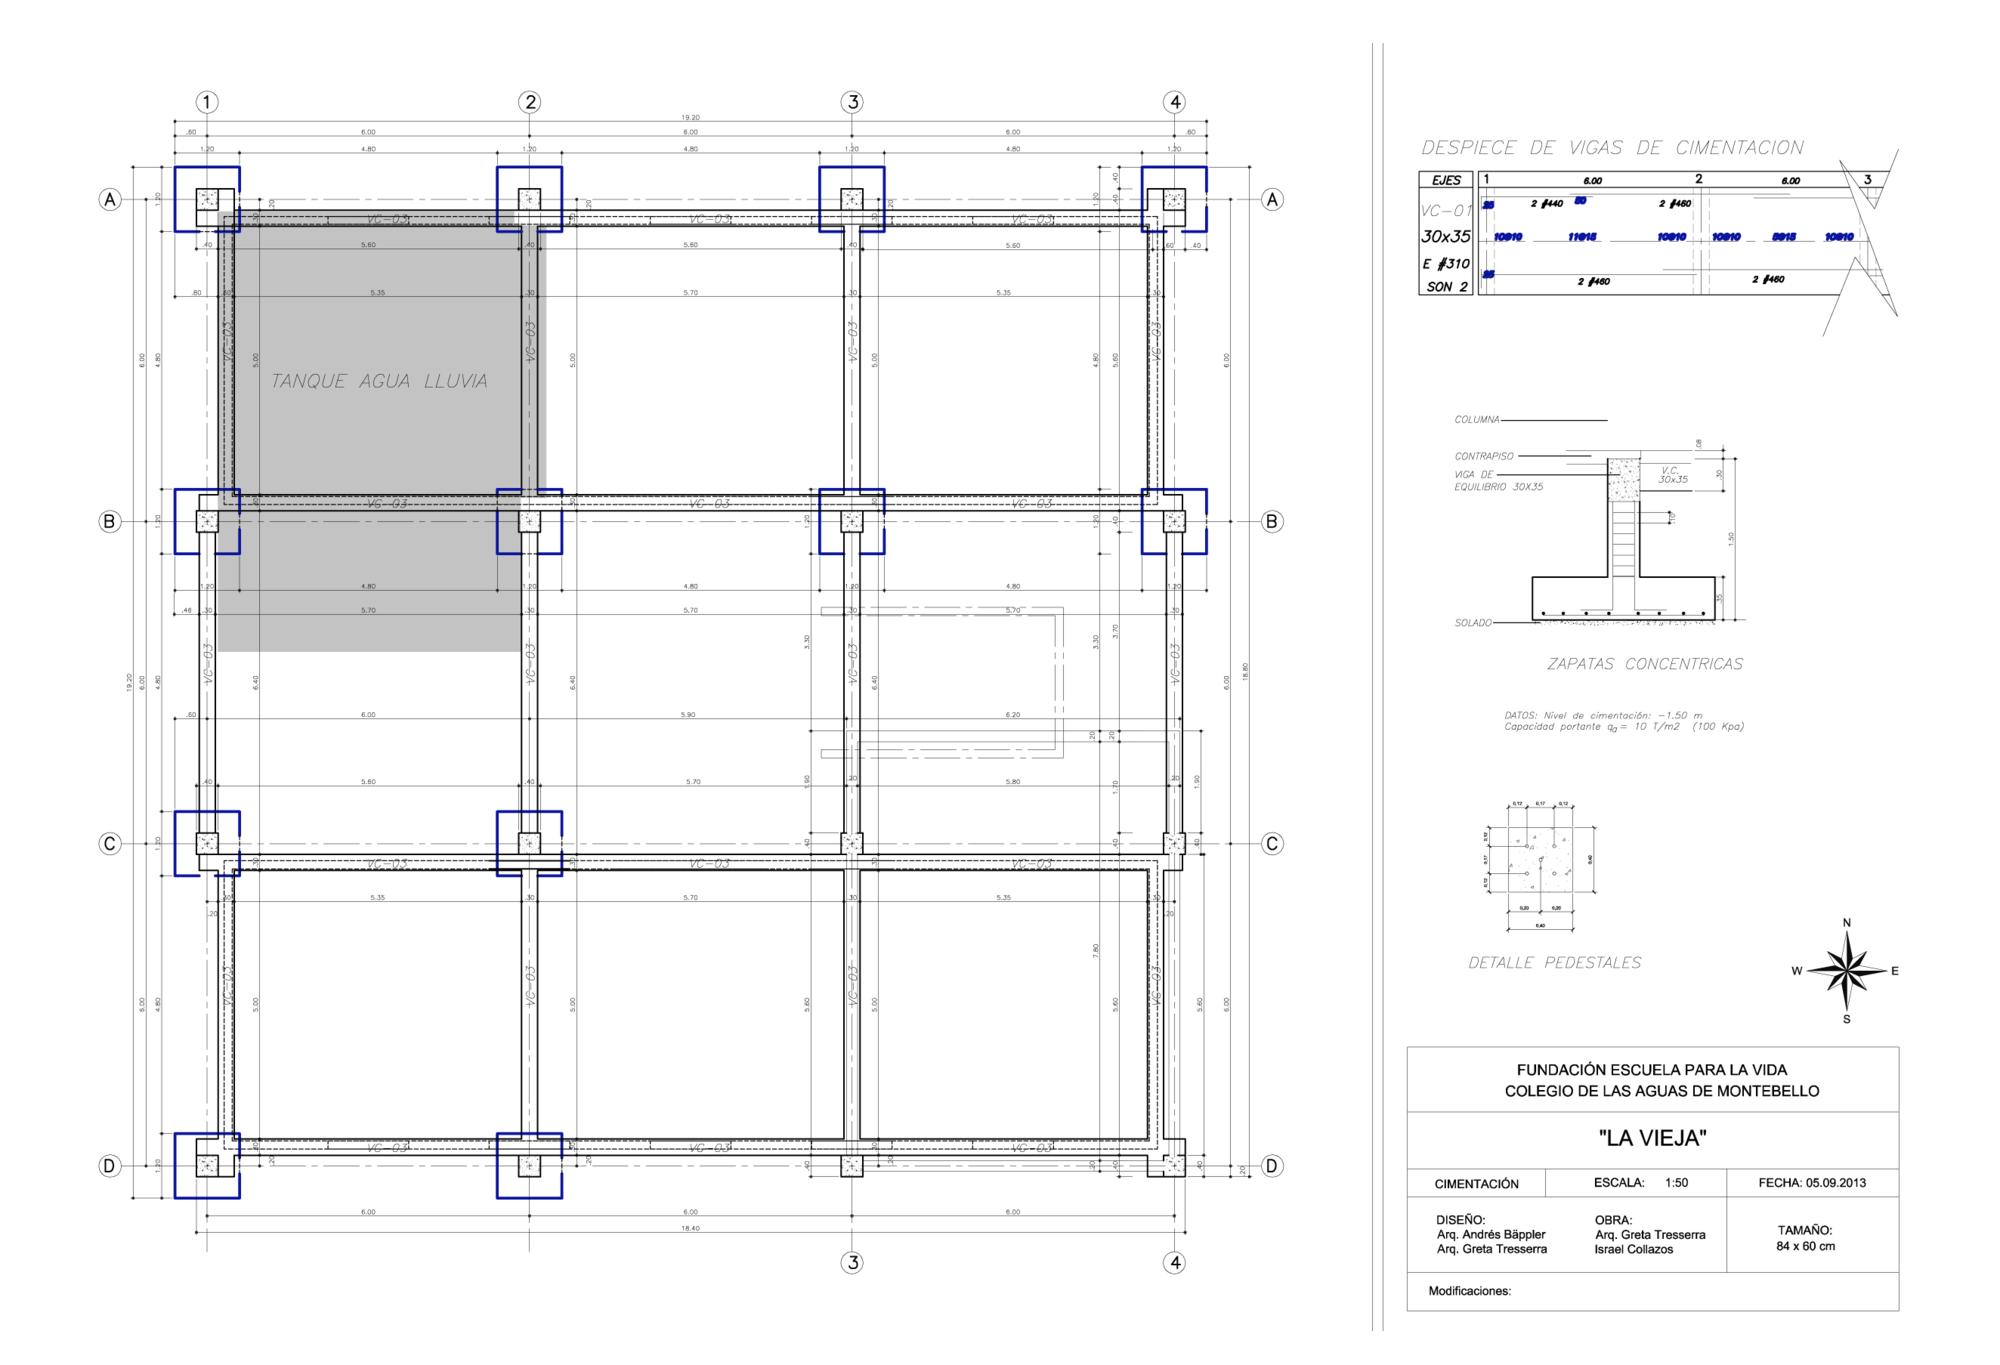 Planta de cimentacion casa construccion pdf